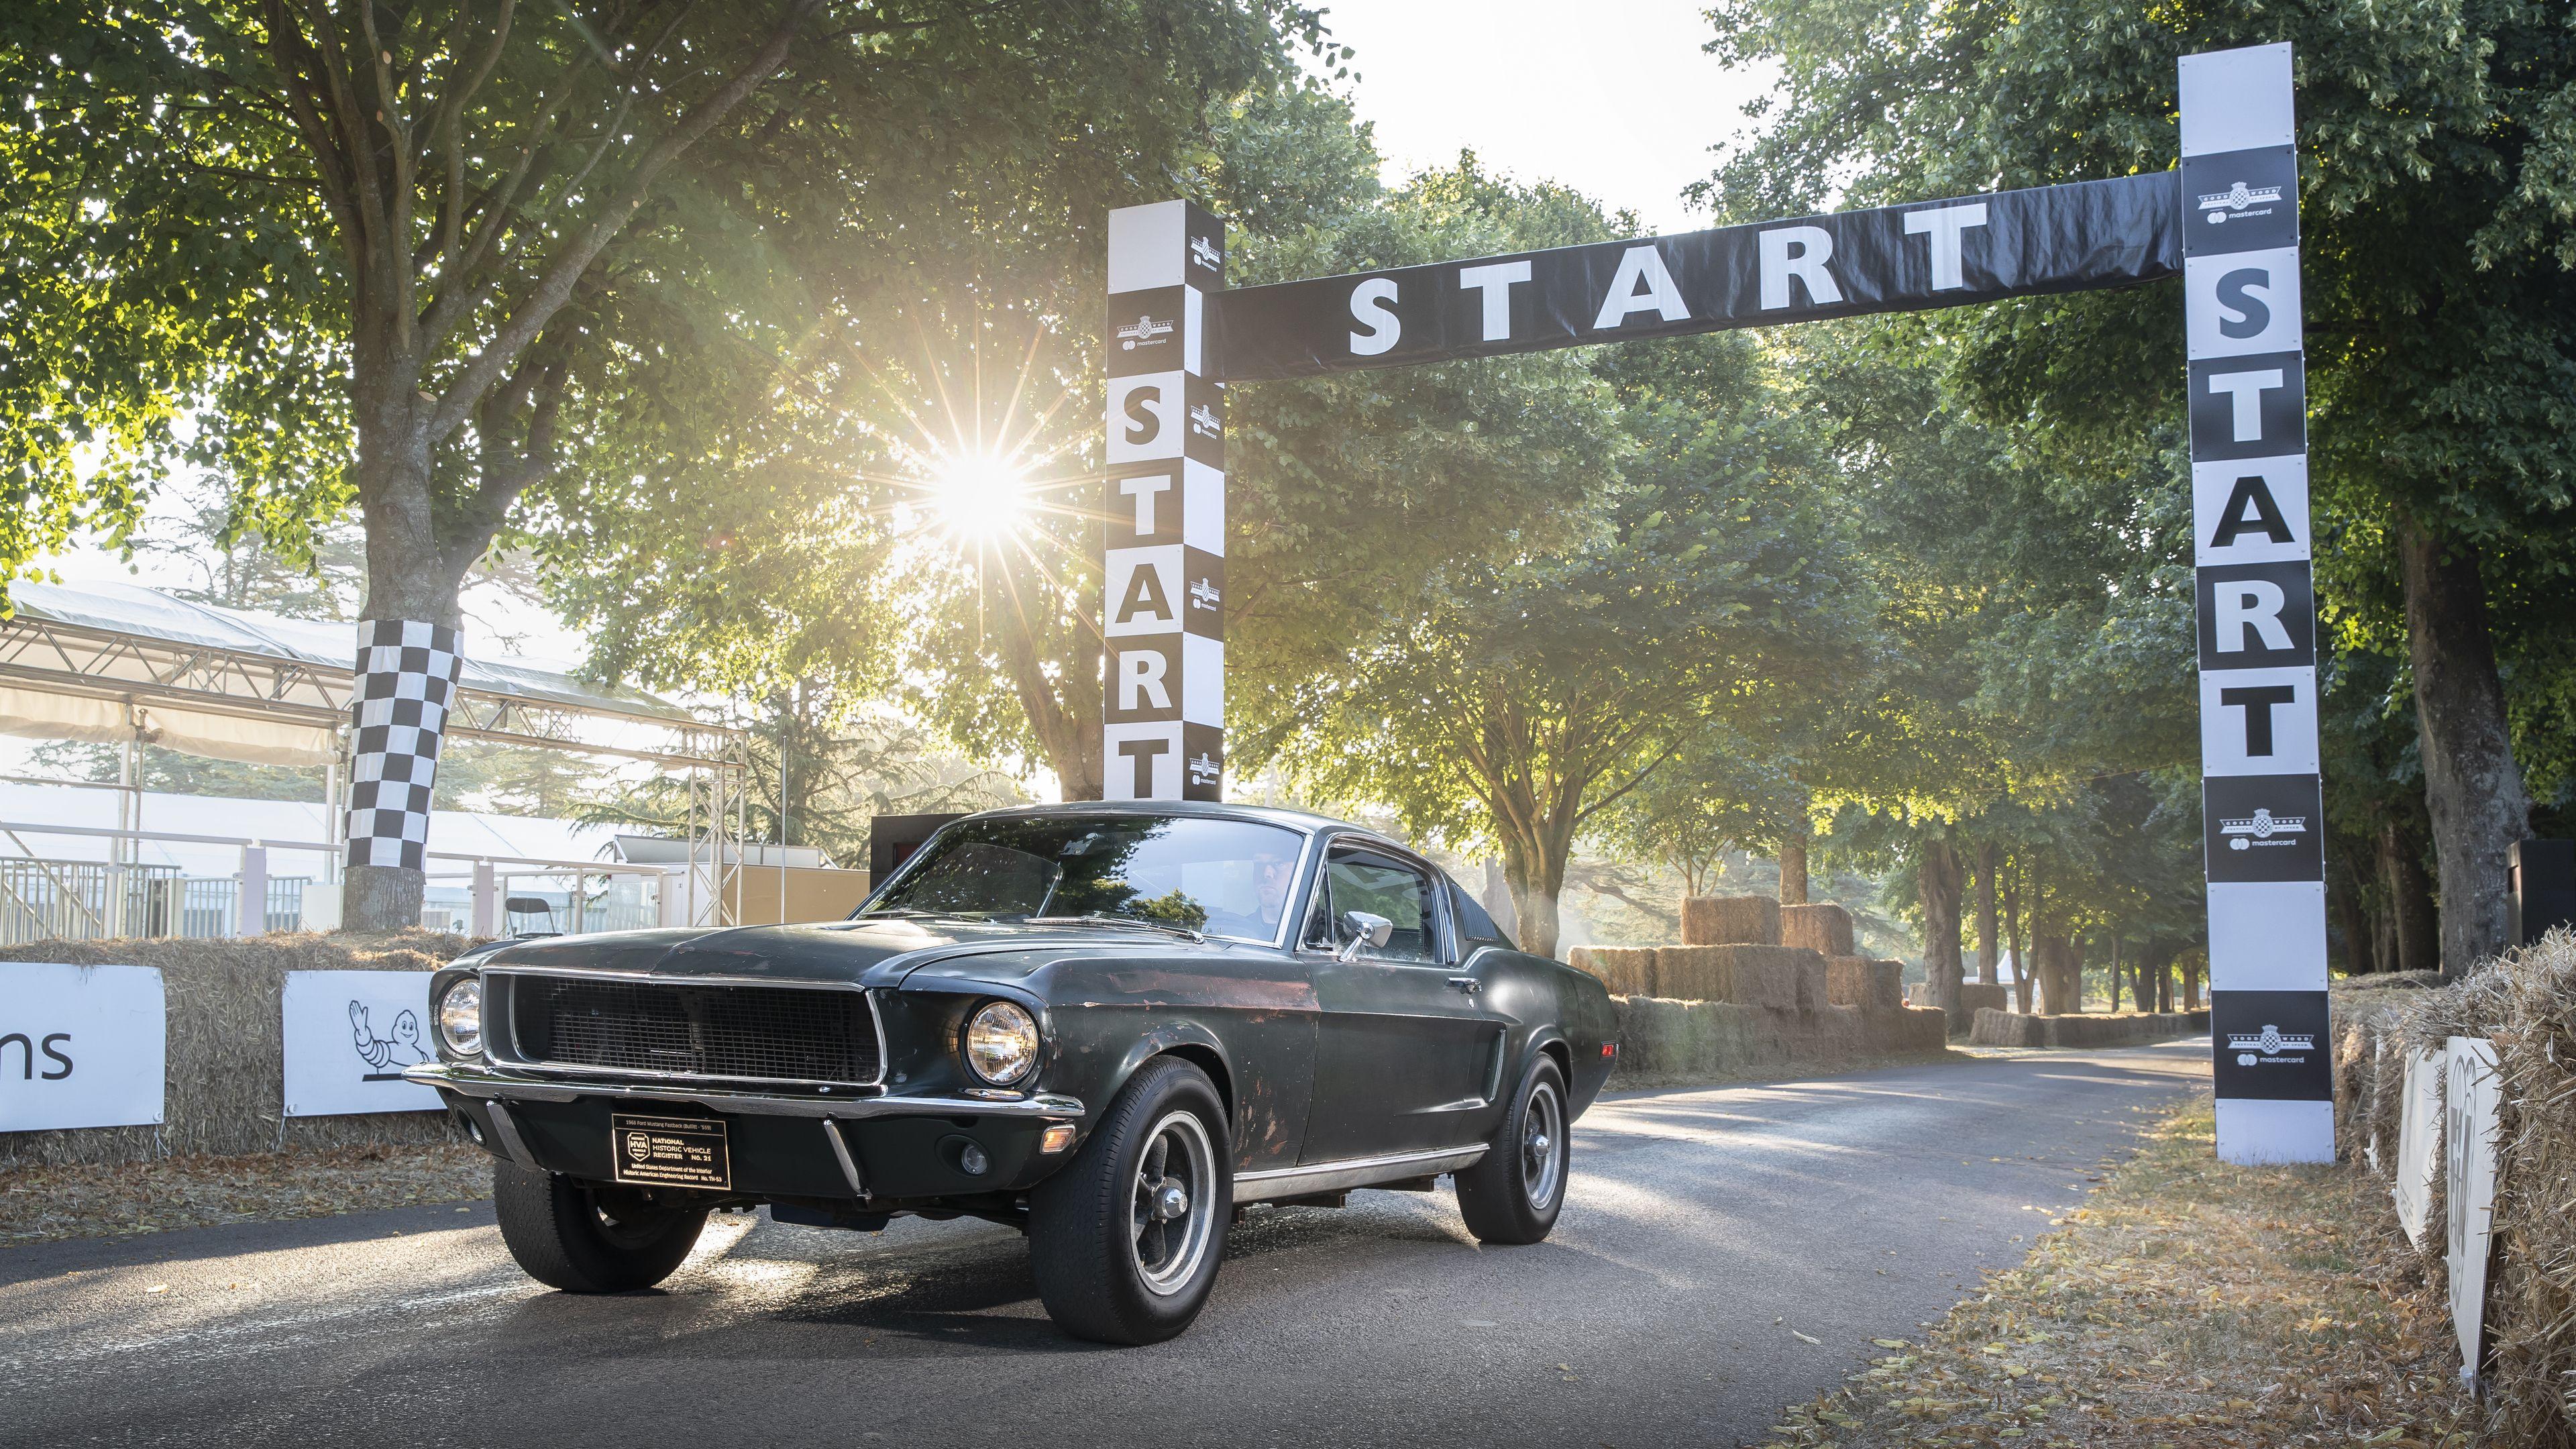 1968 Mustang Gt Fastback 4k Wallpaper Mustang Wallpapers Hd